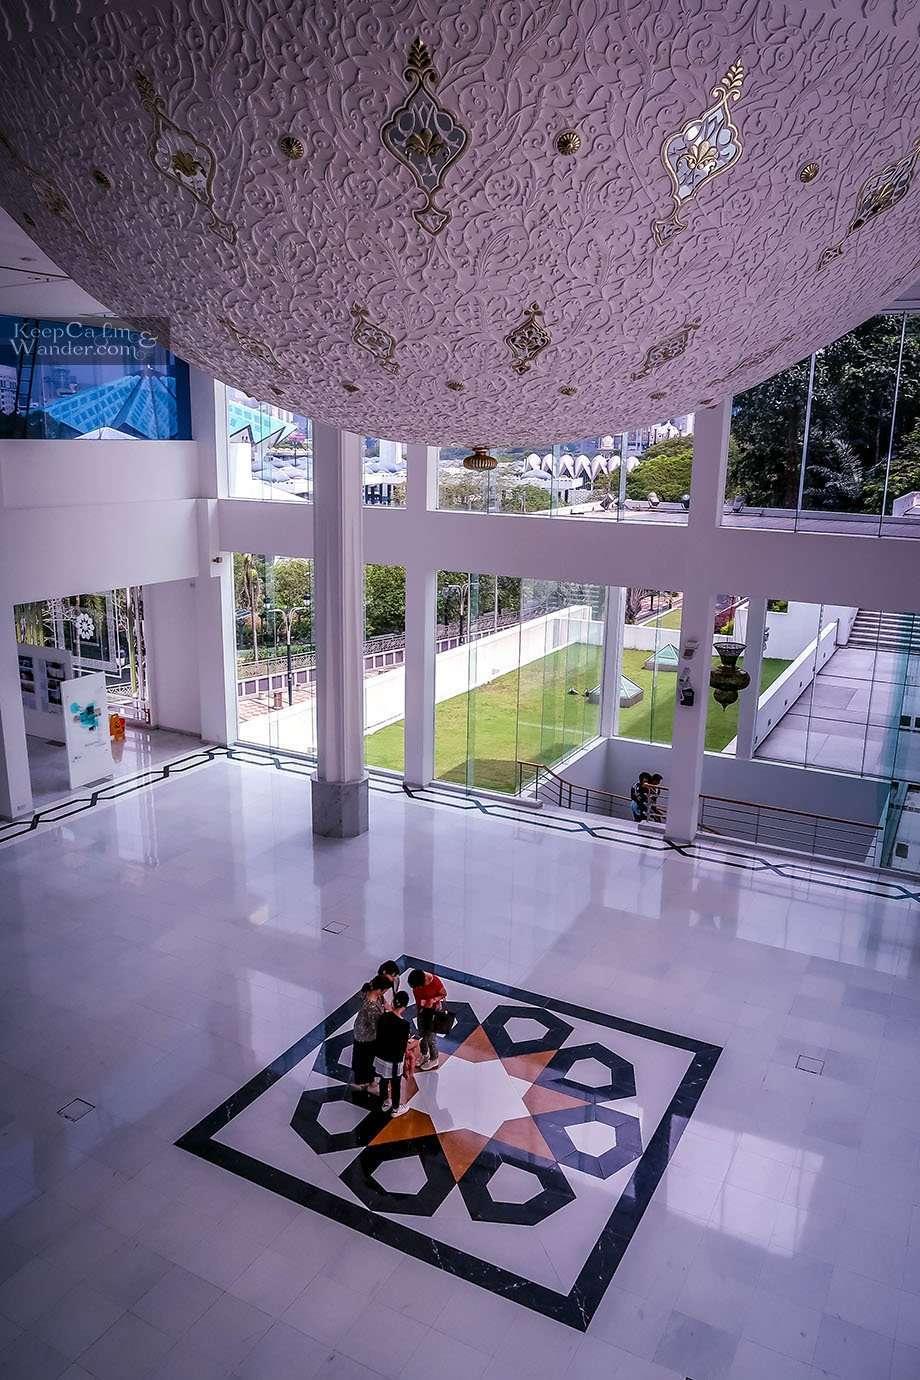 Inverted dome Islamic Arts Museum Kuala Lumpur